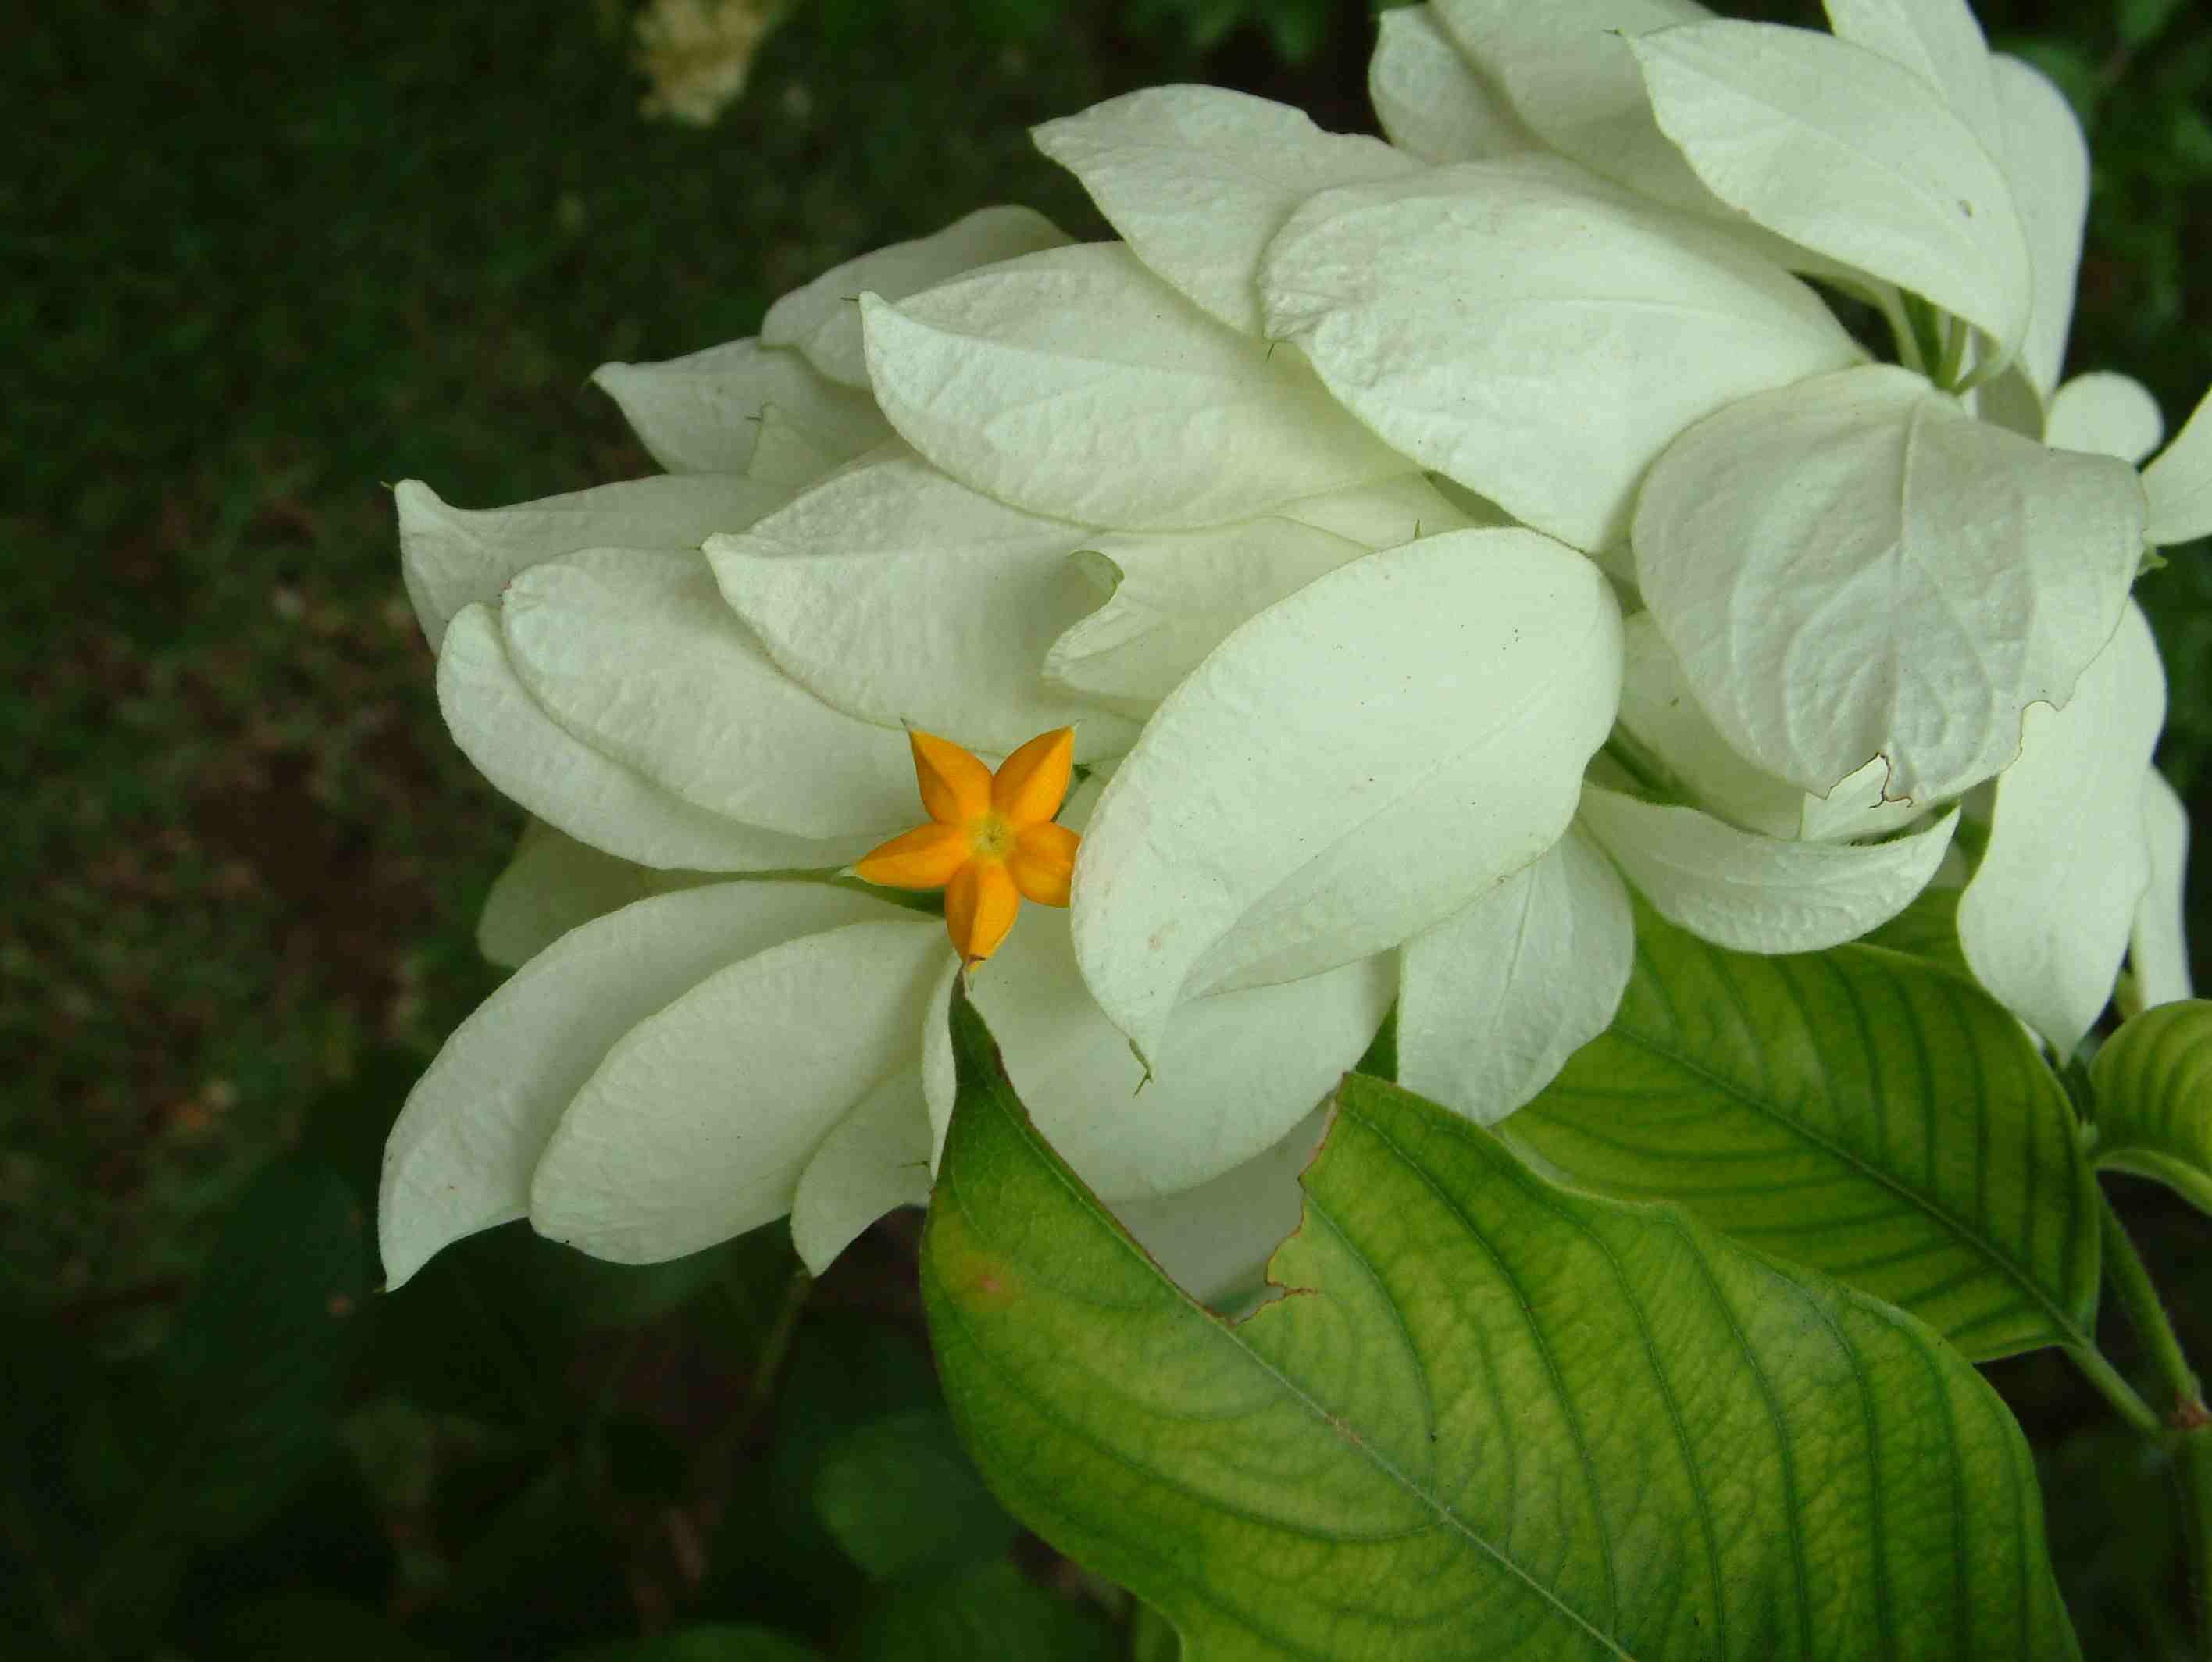 Rubiacéesmussaendaphilippica3(Réunion)